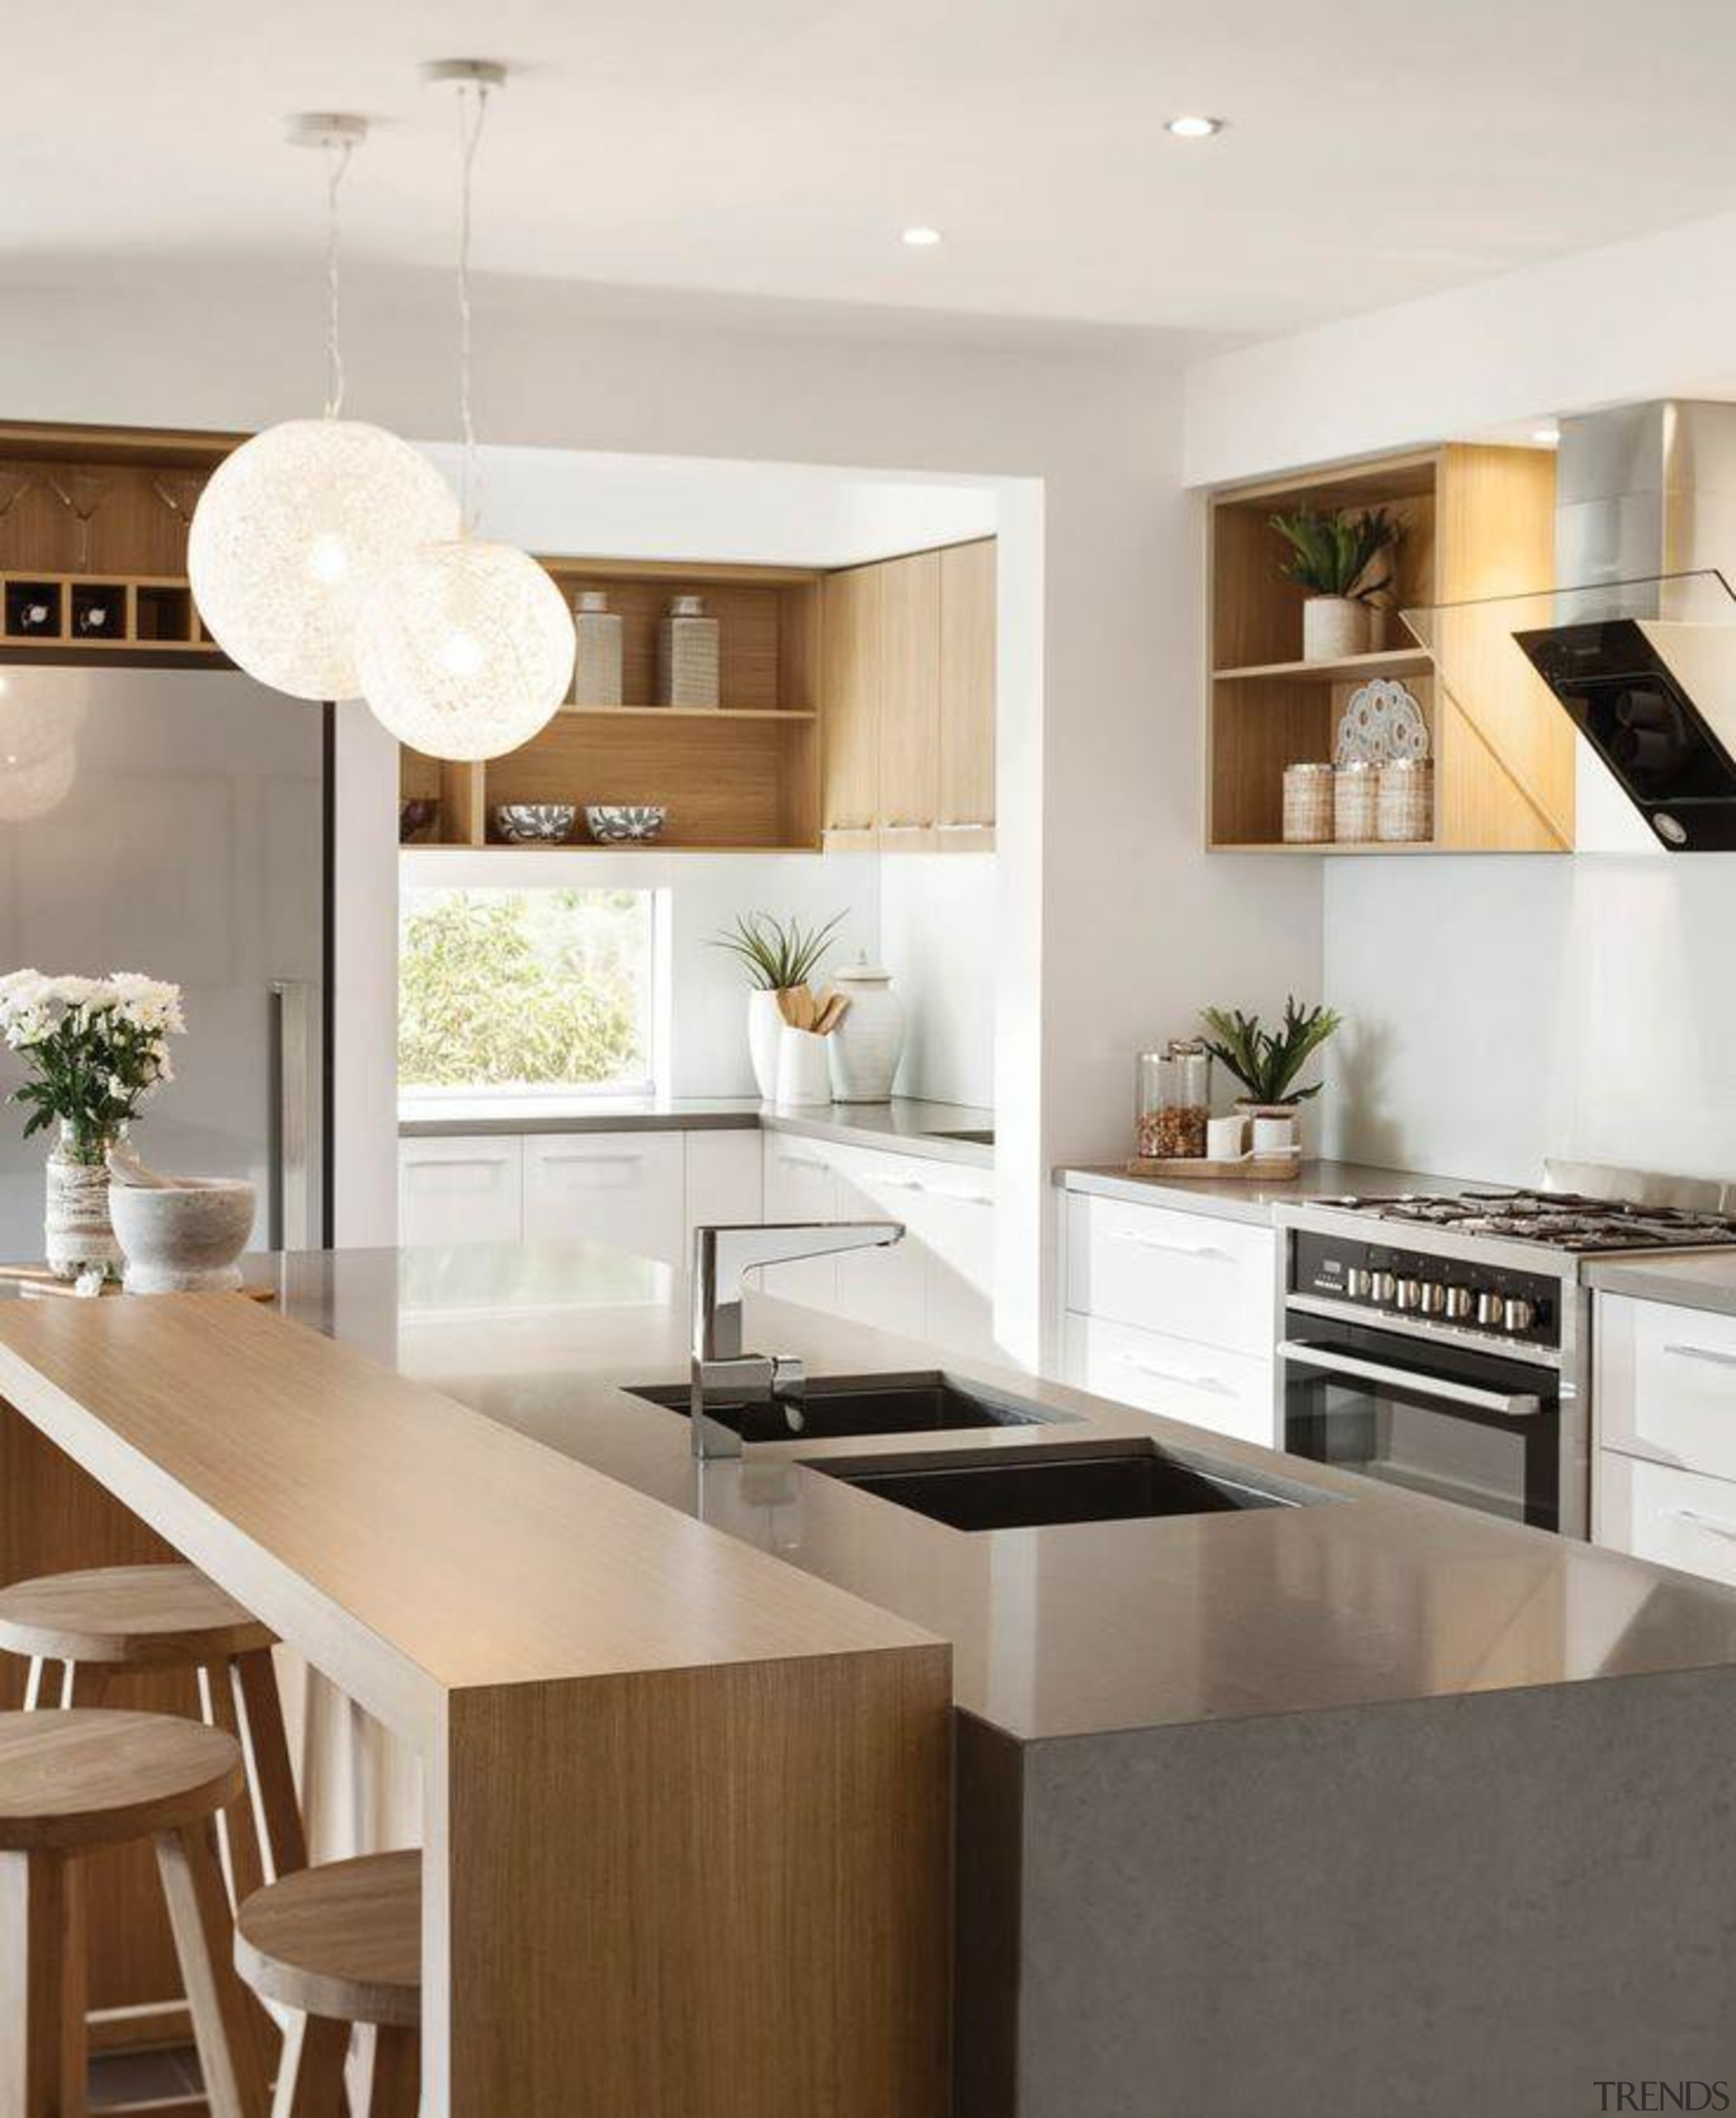 Carlisle Homes Oyster - Oyster™ - countertop | countertop, cuisine classique, interior design, kitchen, table, white